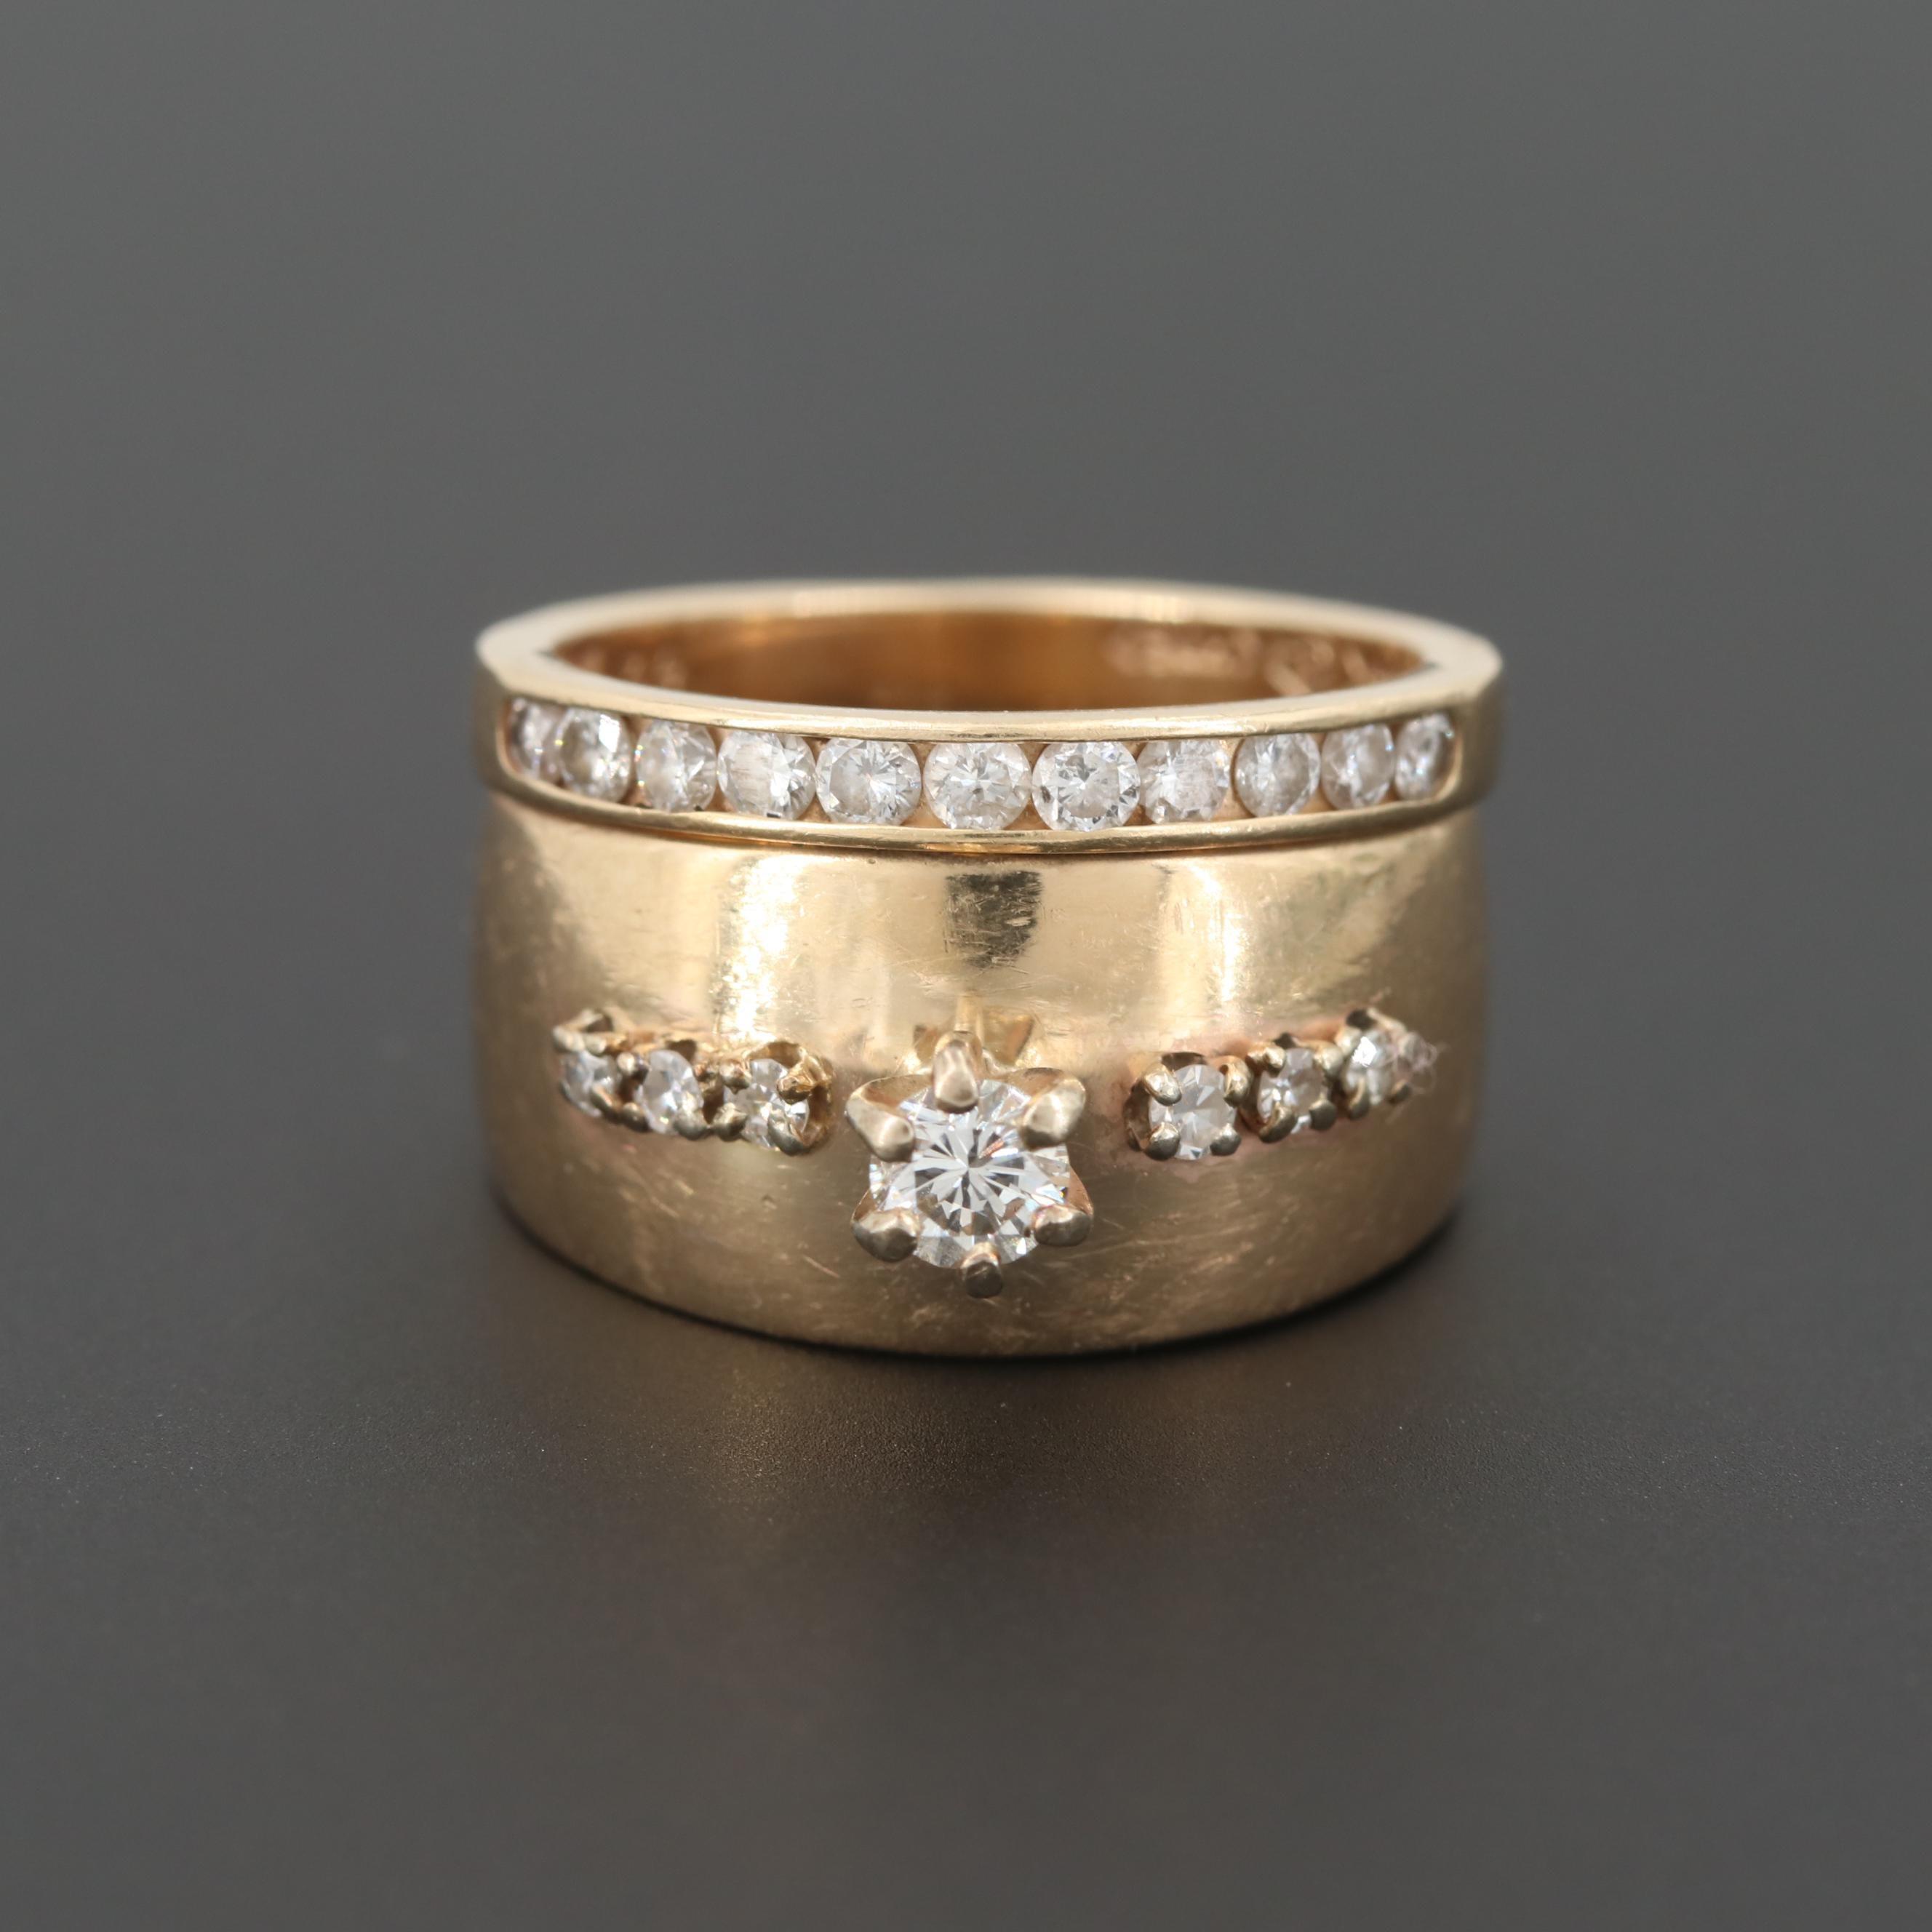 14K Yellow Gold Diamond Ring Set